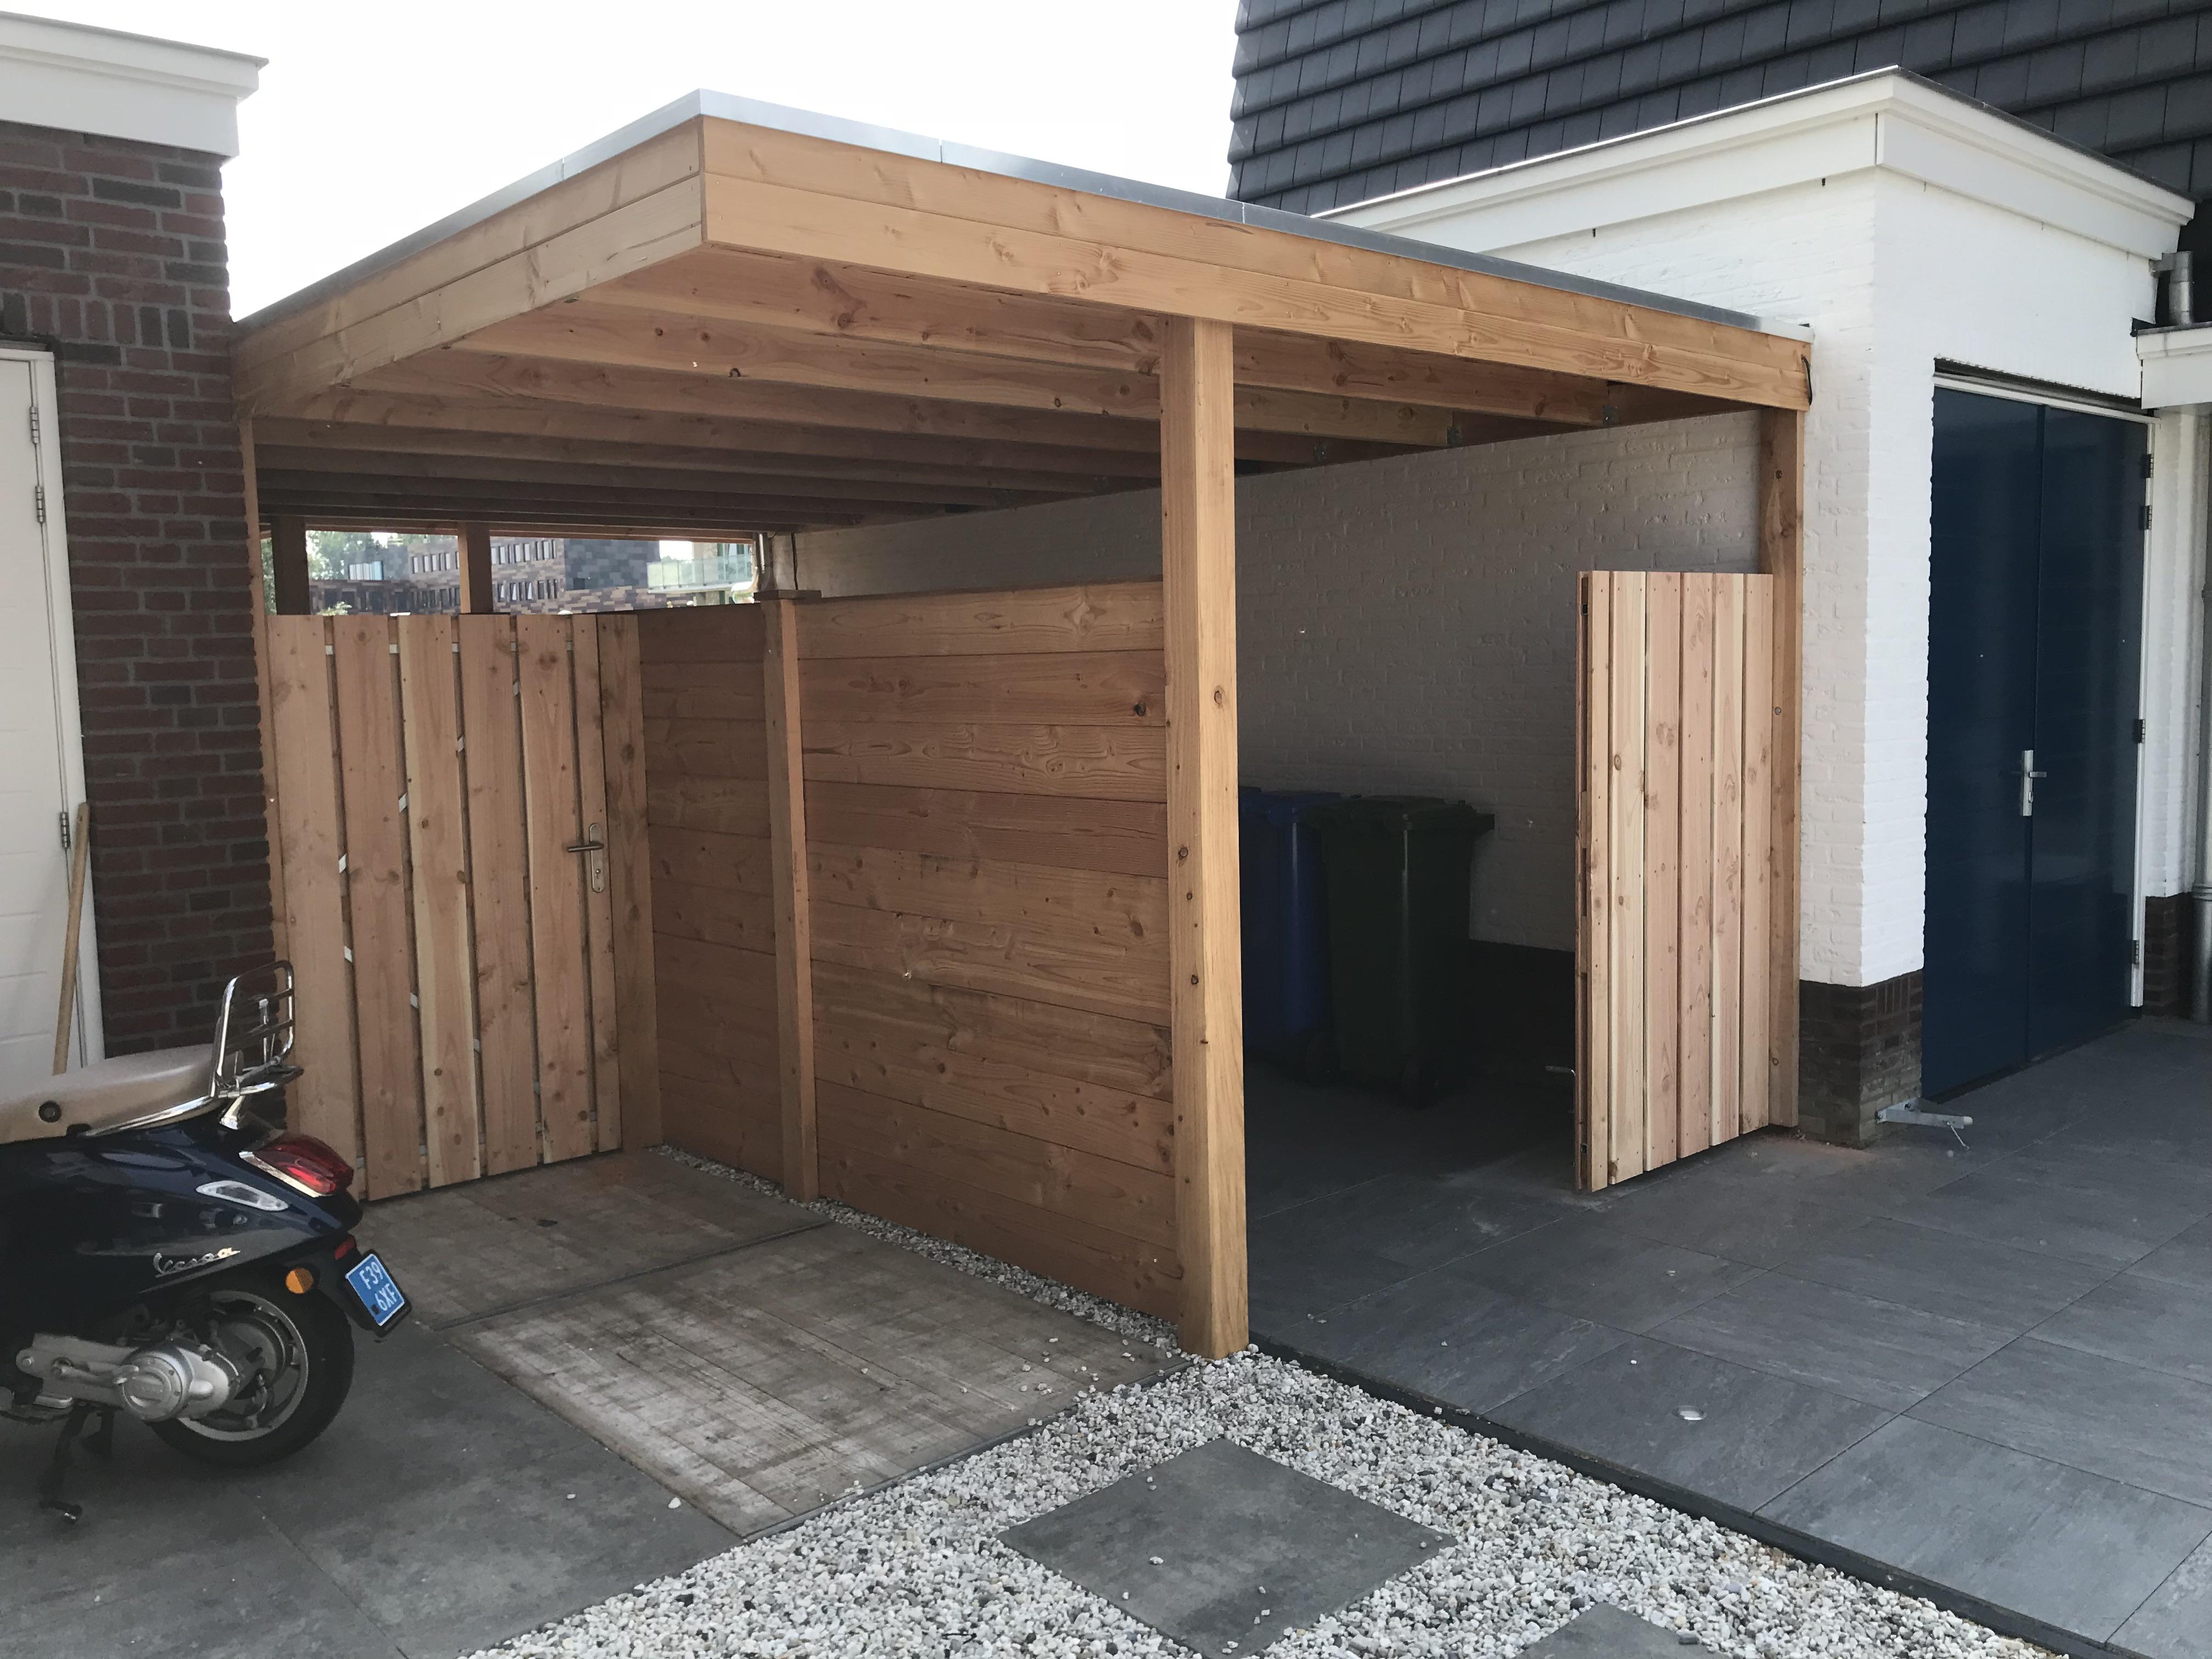 Douglas houten overkapping